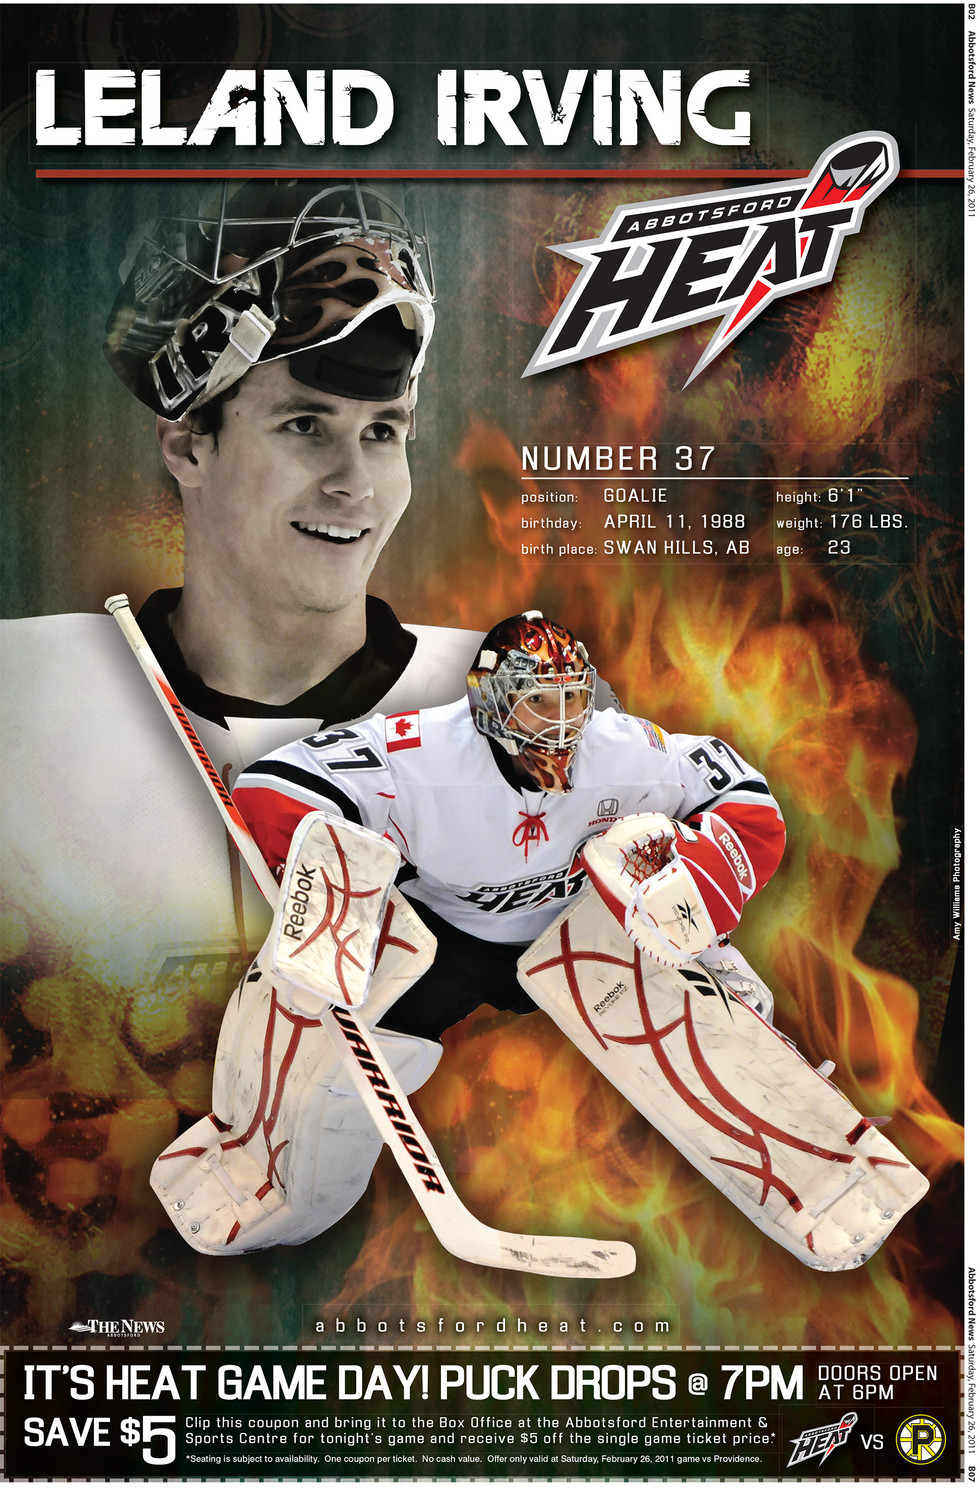 Abbotsford Heat Poster - Leland Irving